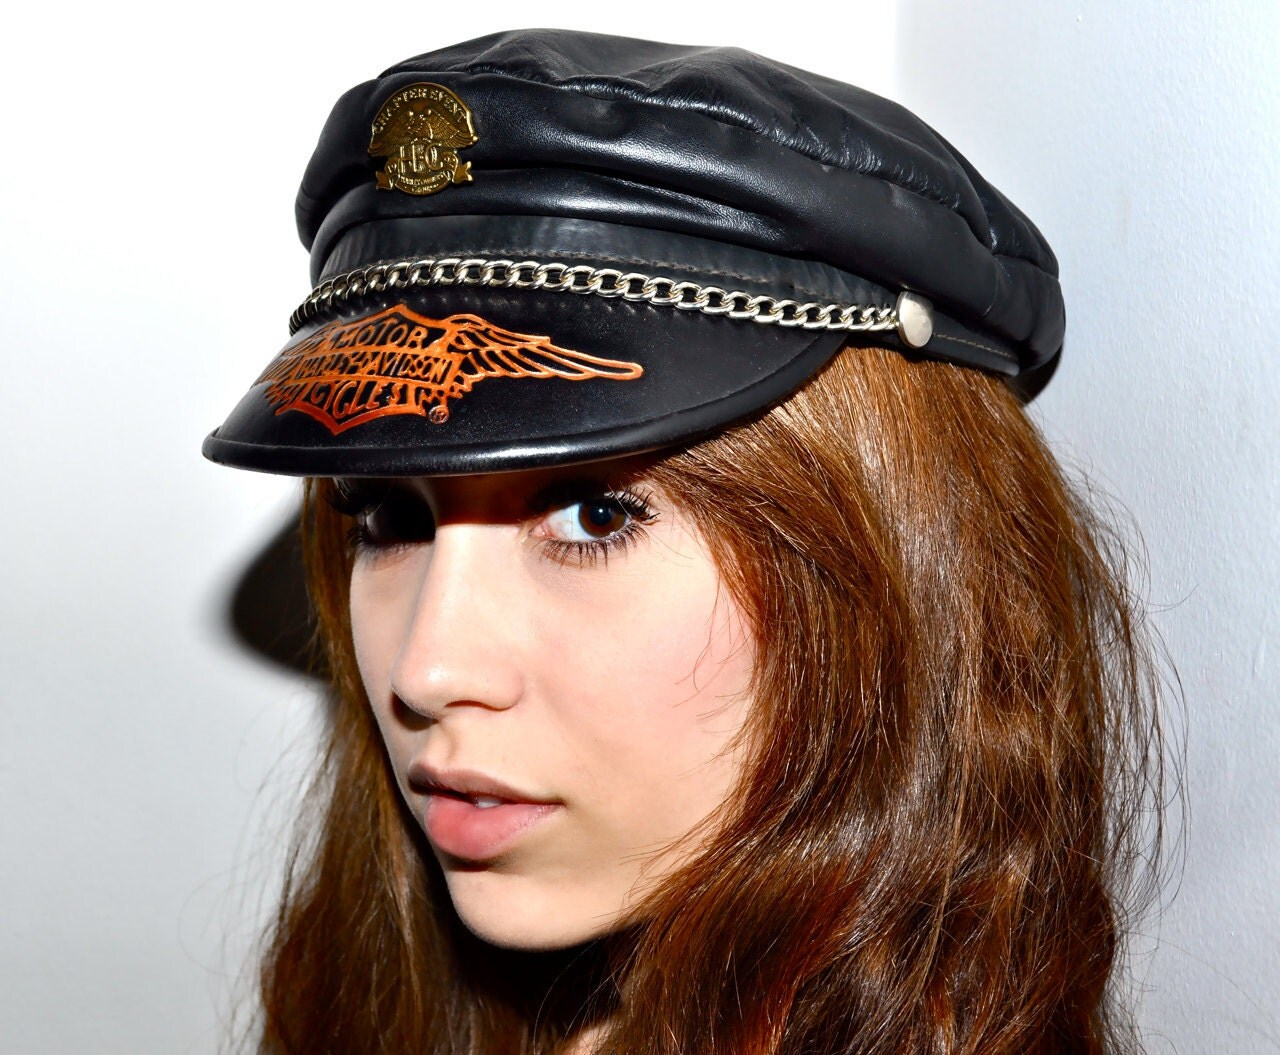 Hats, Harley-Davidson, American, Motorcycles ...  |Vintage Harley Davidson Hats